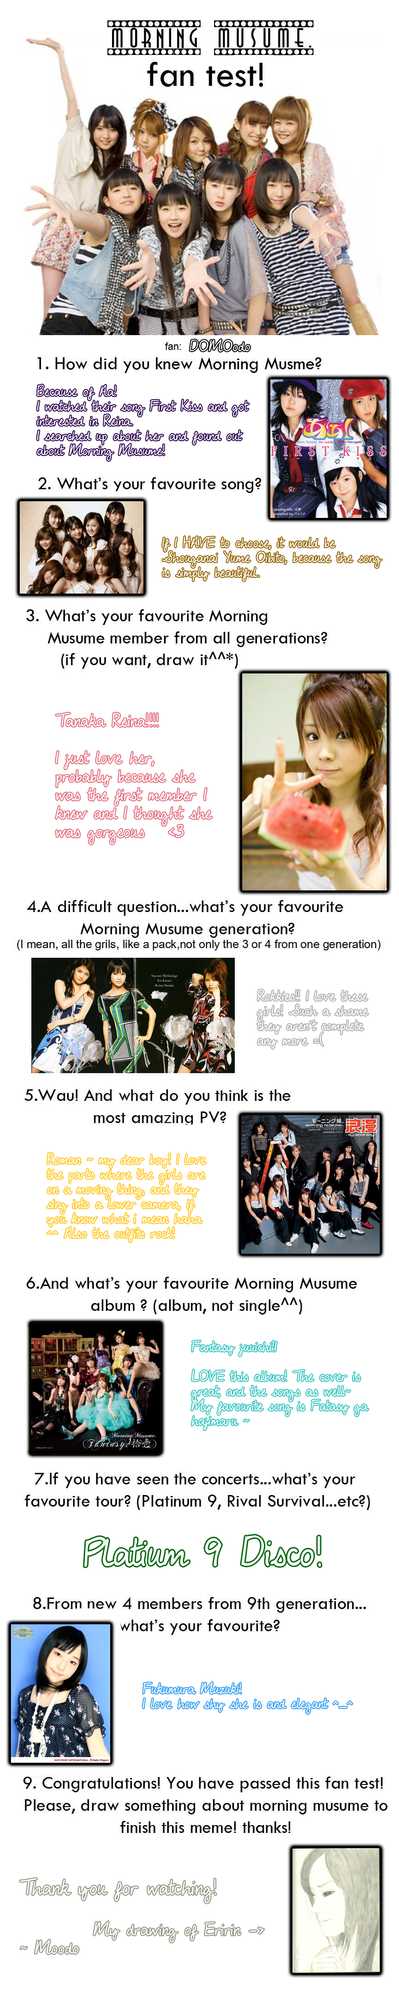 Morning Musume Fan Test by DOMOodo